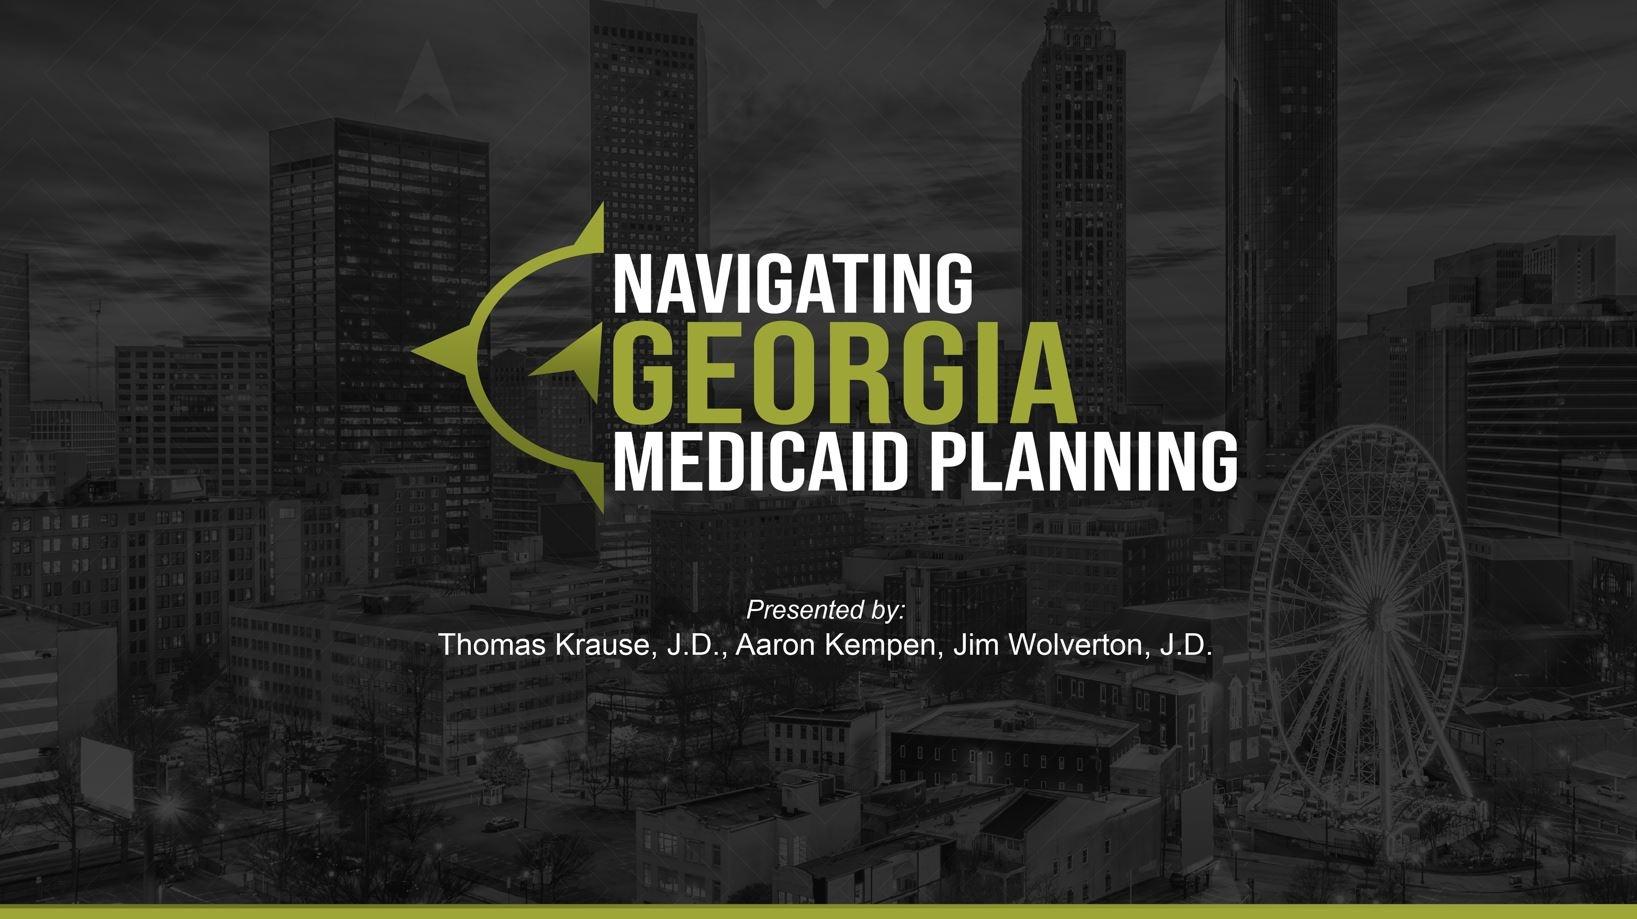 Navigating Georgia Medicaid Planning Virtual Seminar